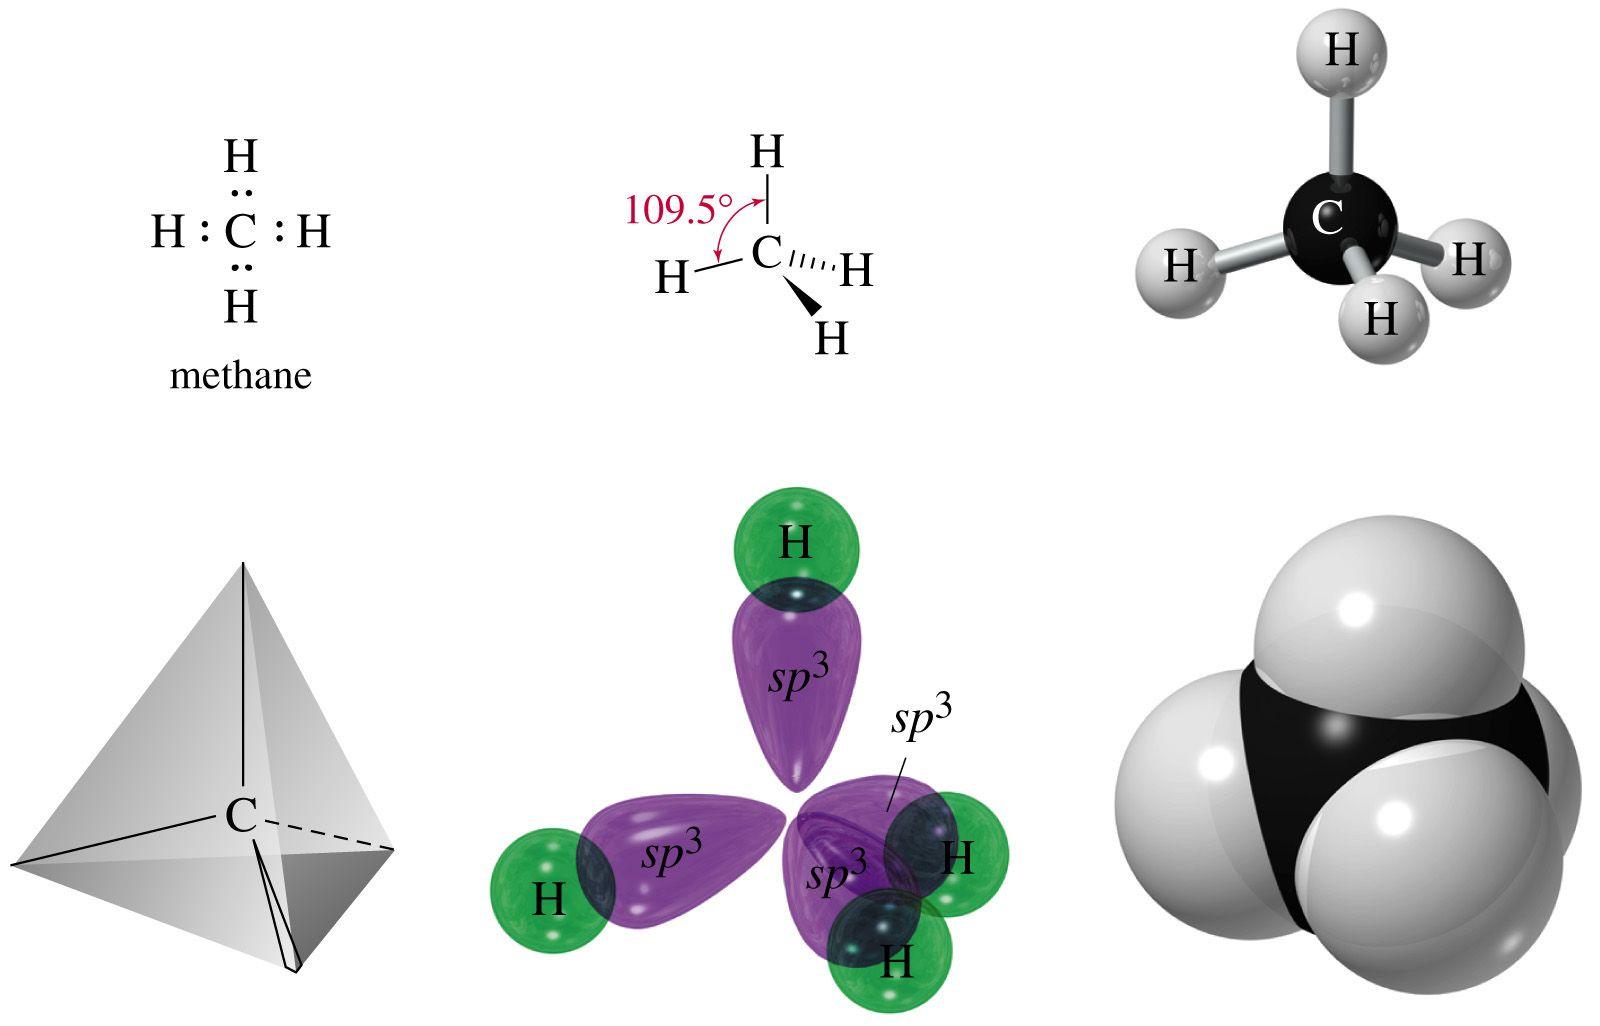 стоит модель молекулы метана картинка поздравляю